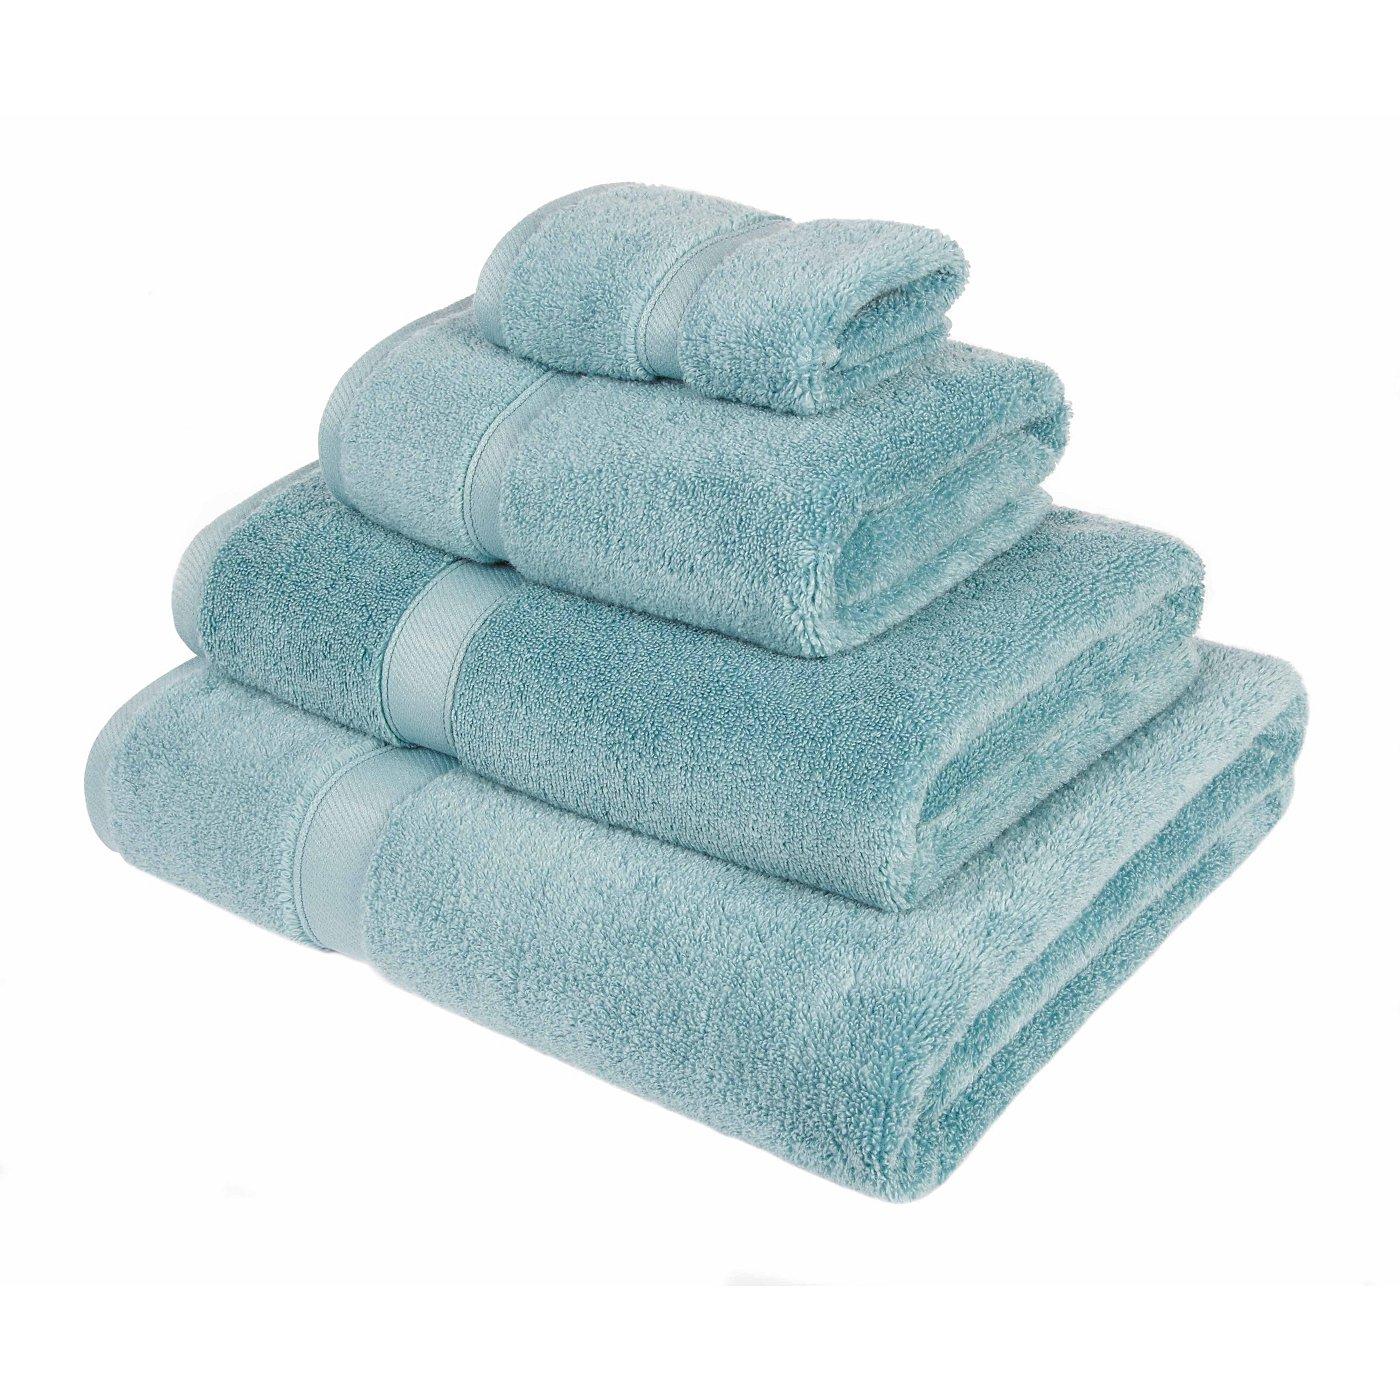 Blue Towels Bath Mats Home Garden George At Asda